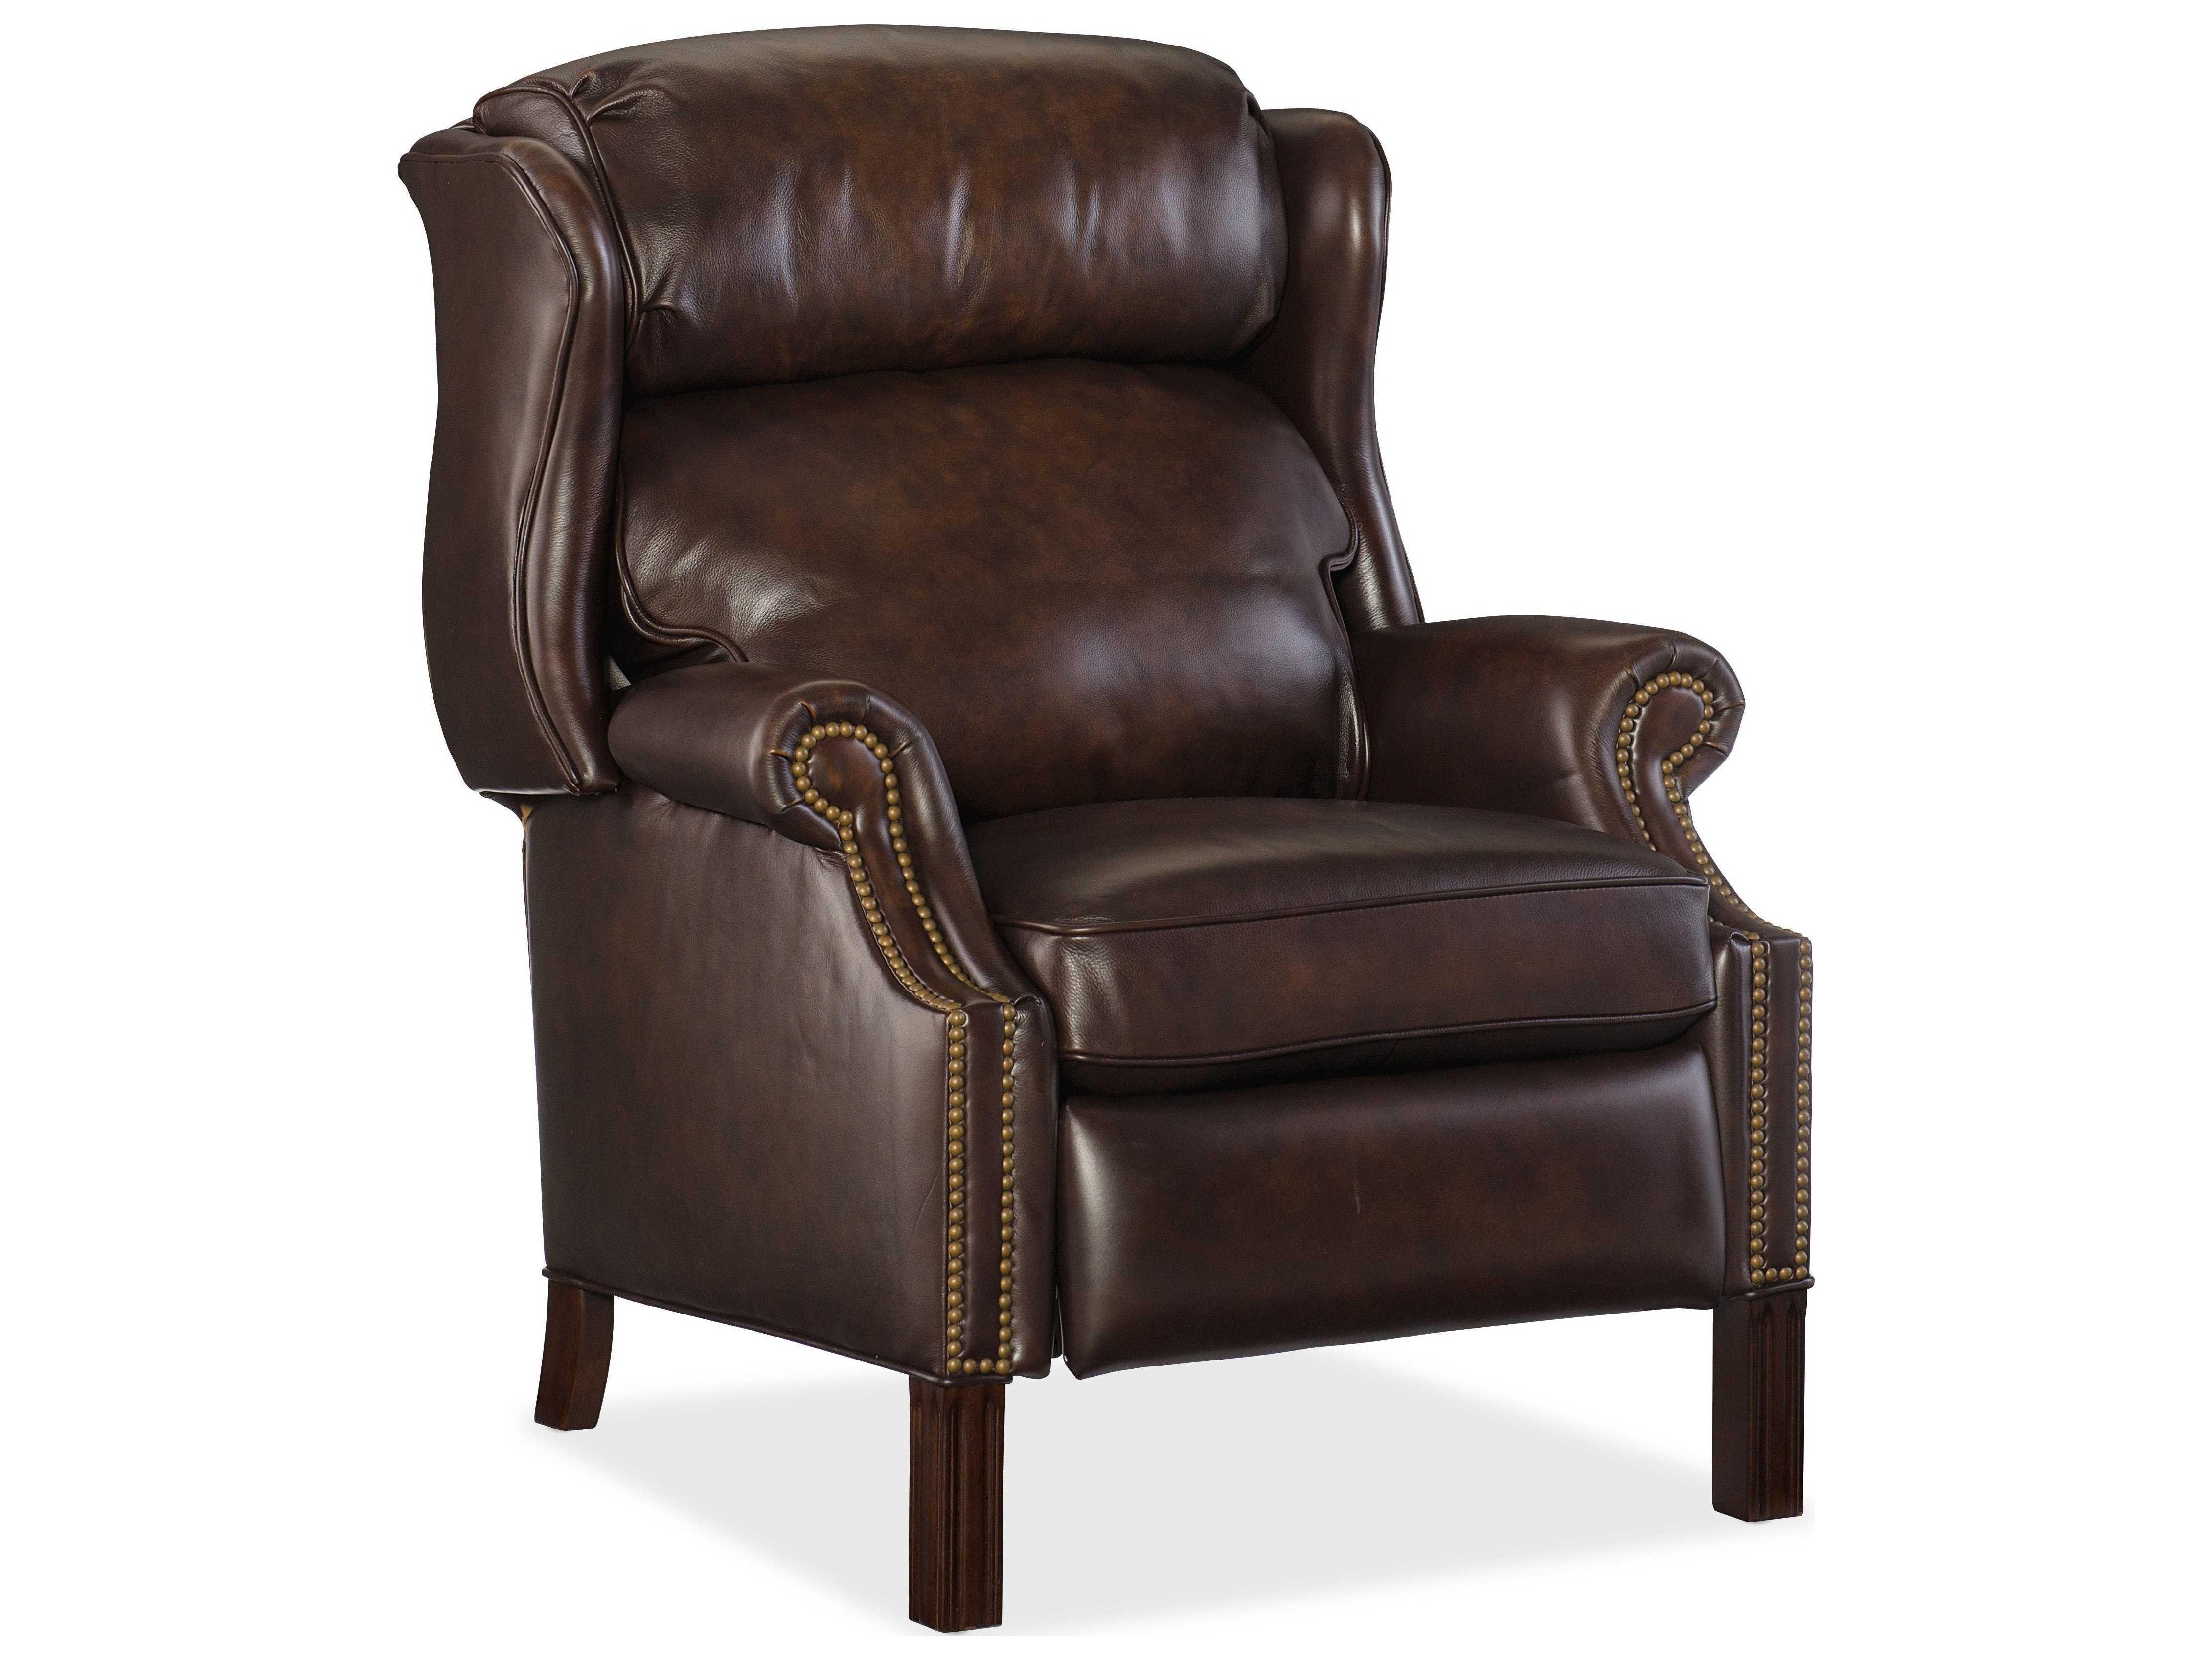 Fabulous Hooker Furniture Rc Sedona Vortex Dark Wood Recliner Chair Evergreenethics Interior Chair Design Evergreenethicsorg